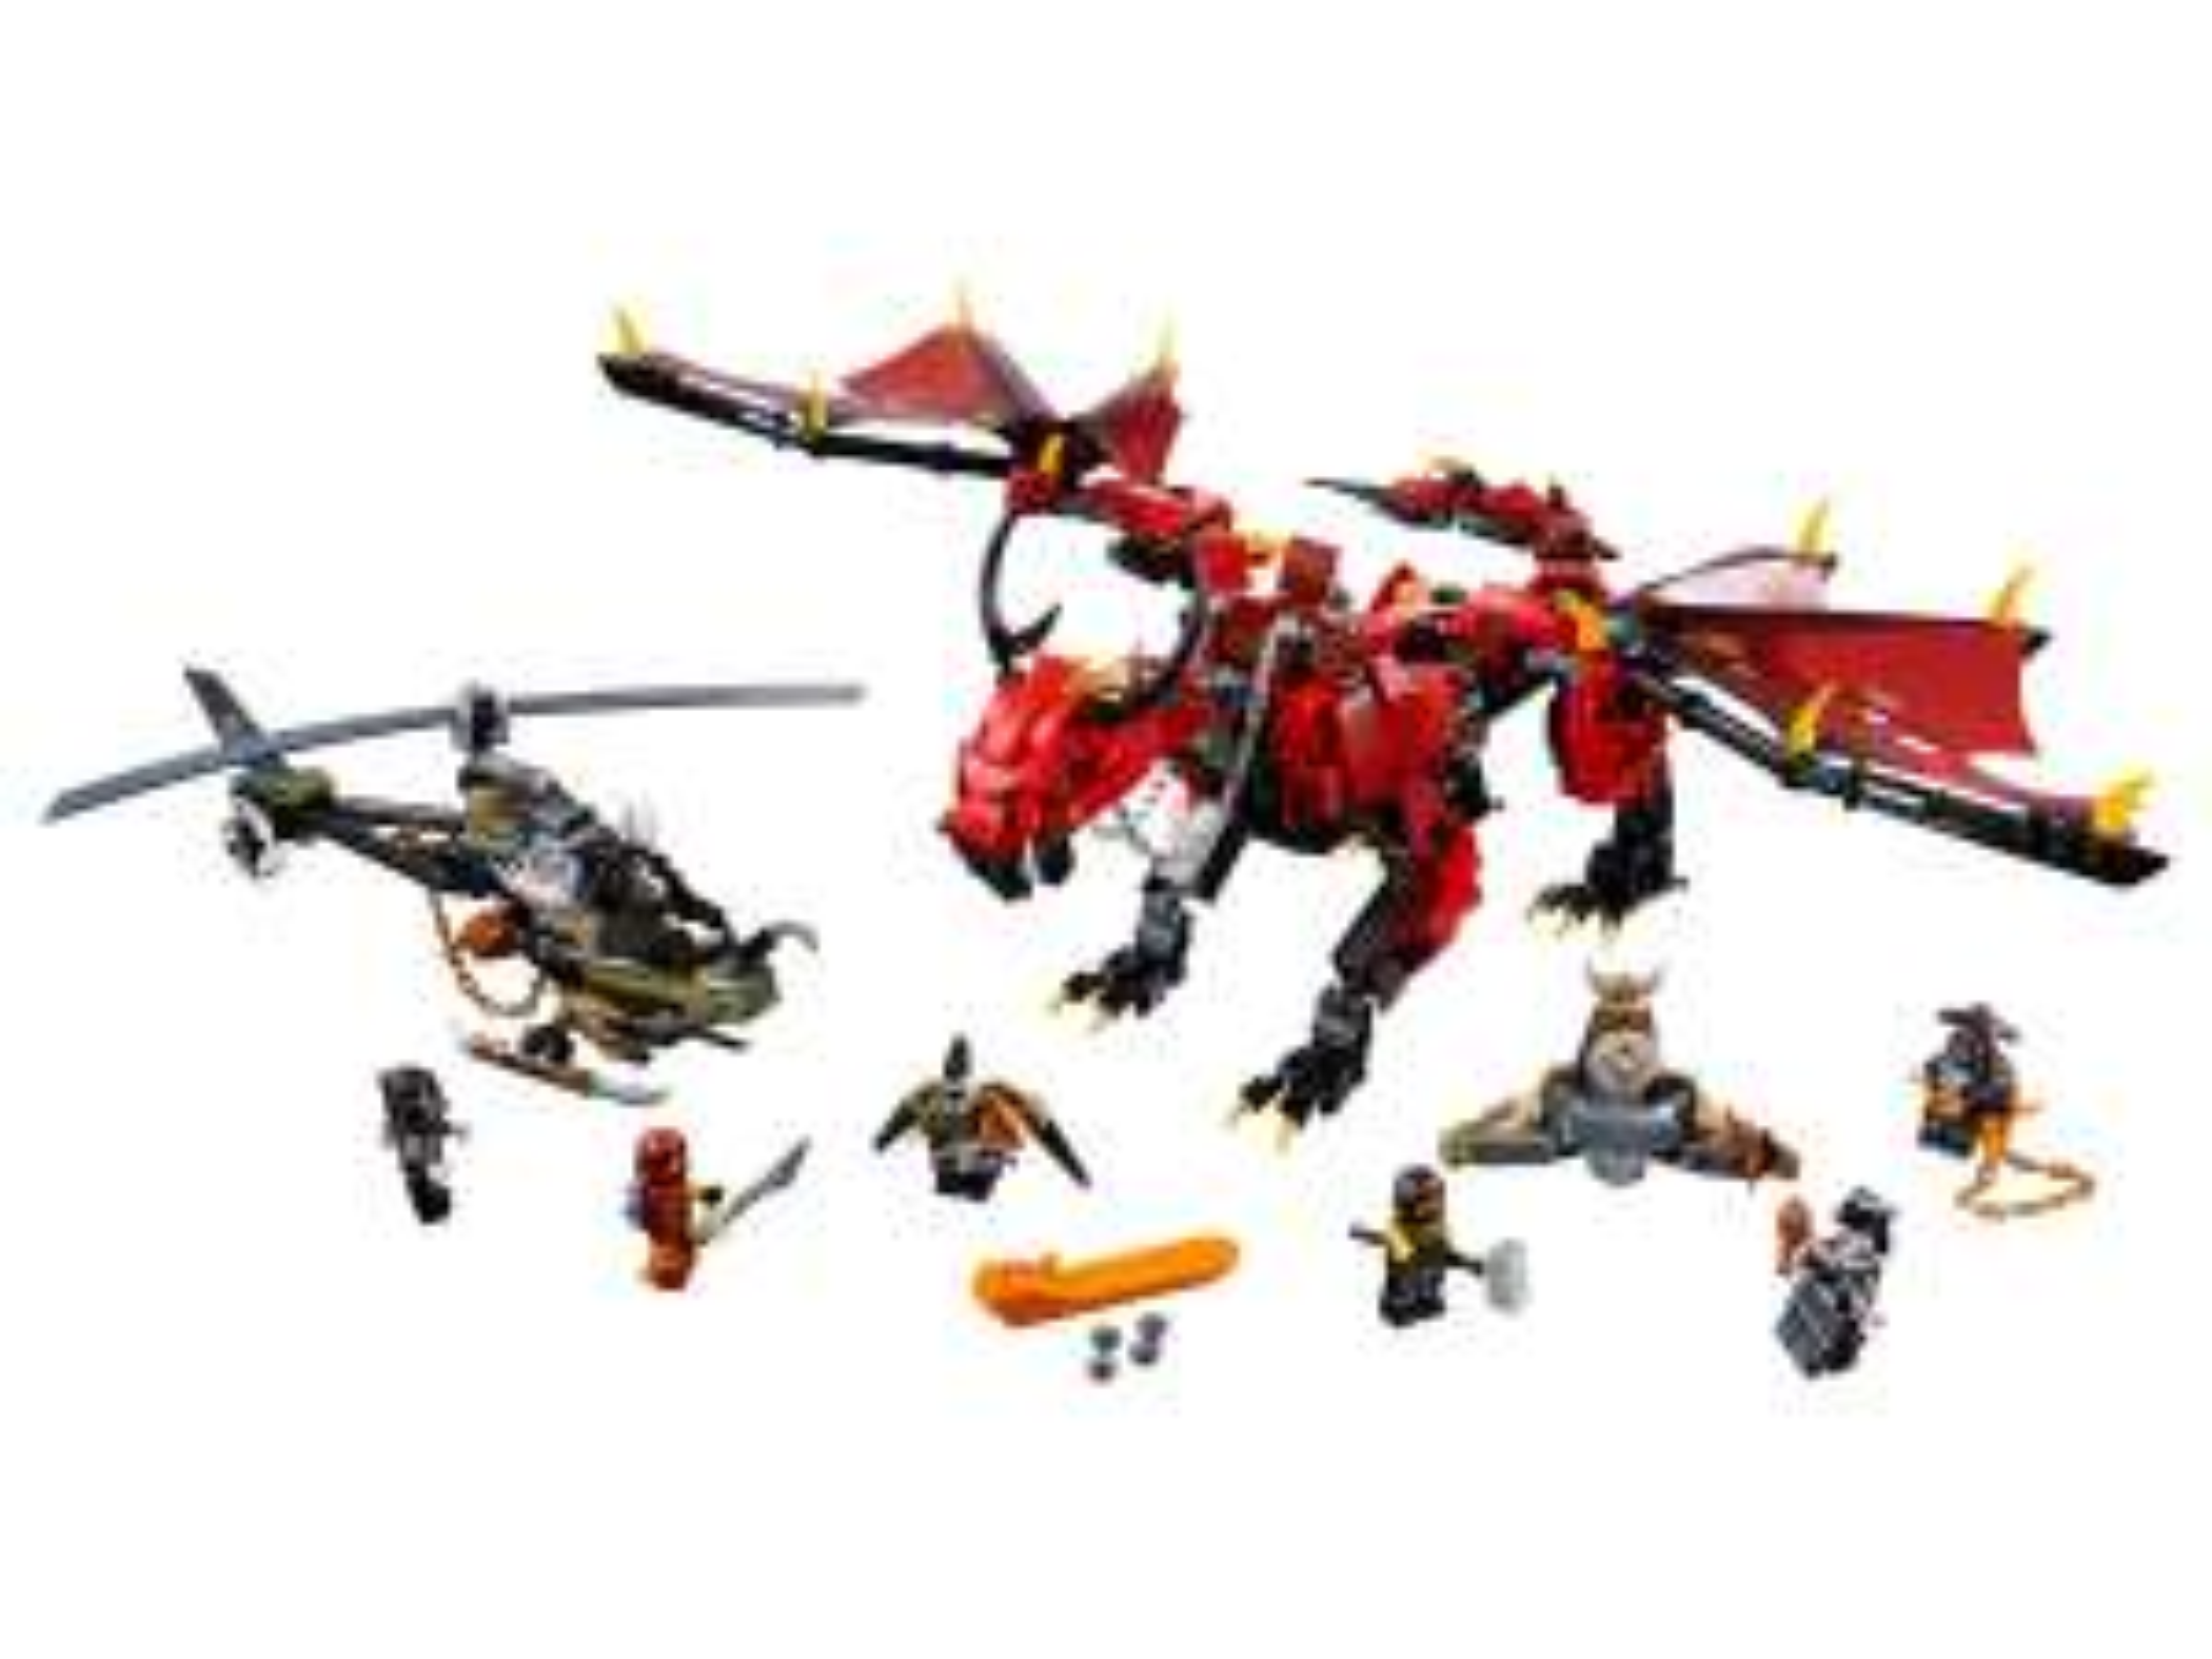 LEGO® Ninjago 70653 Mutter der Drachen Amazon UK 37,87 Euro